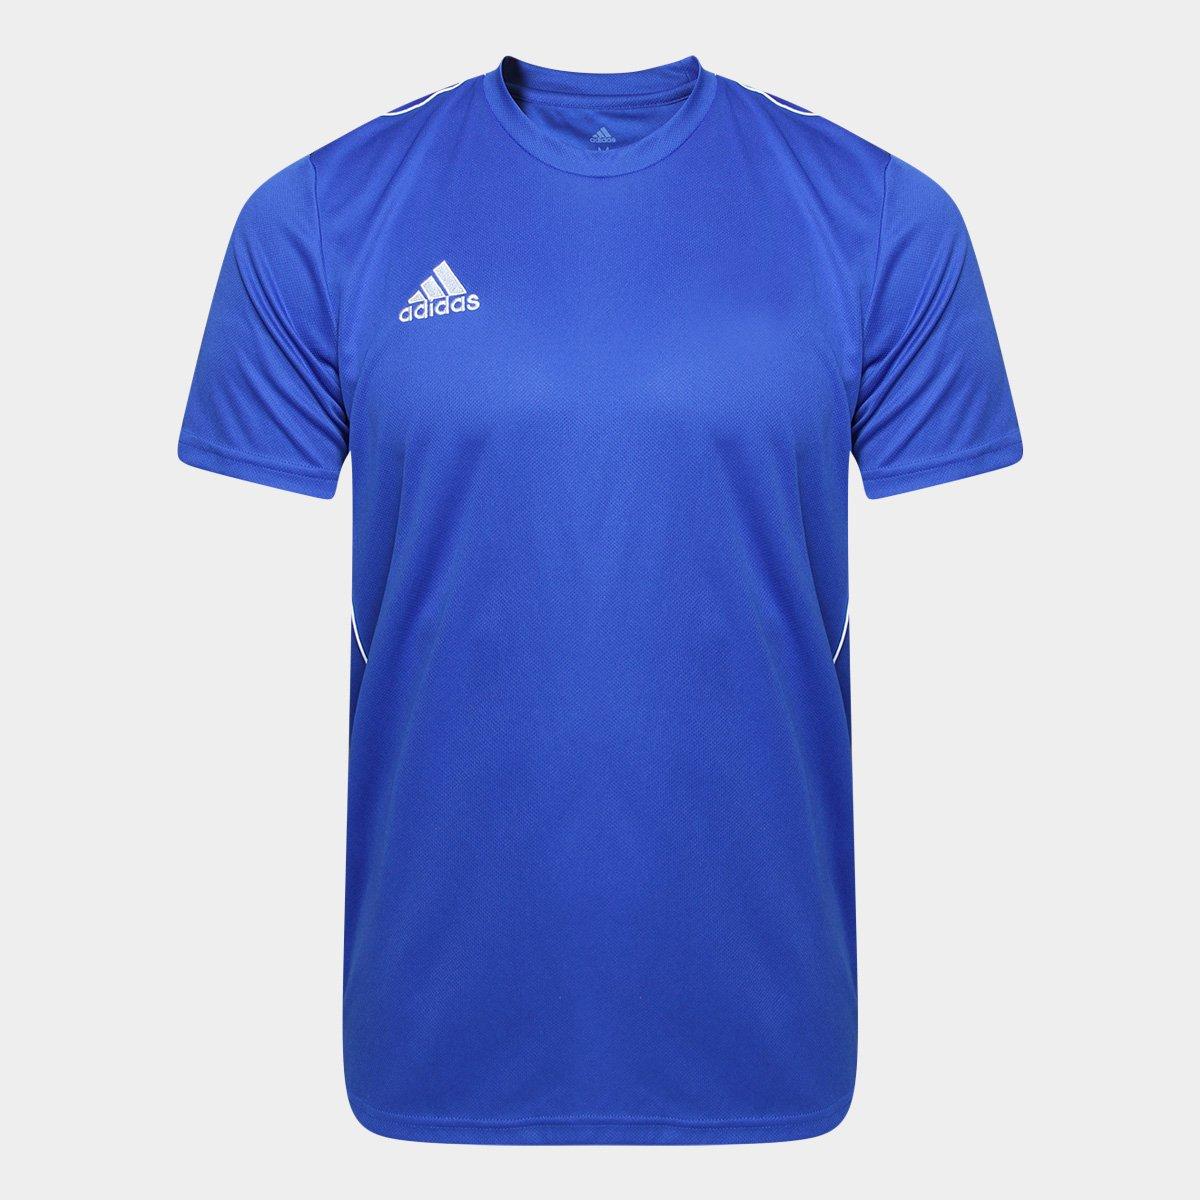 Compre Camisa Adidas Azul Online  163c06c2a136f